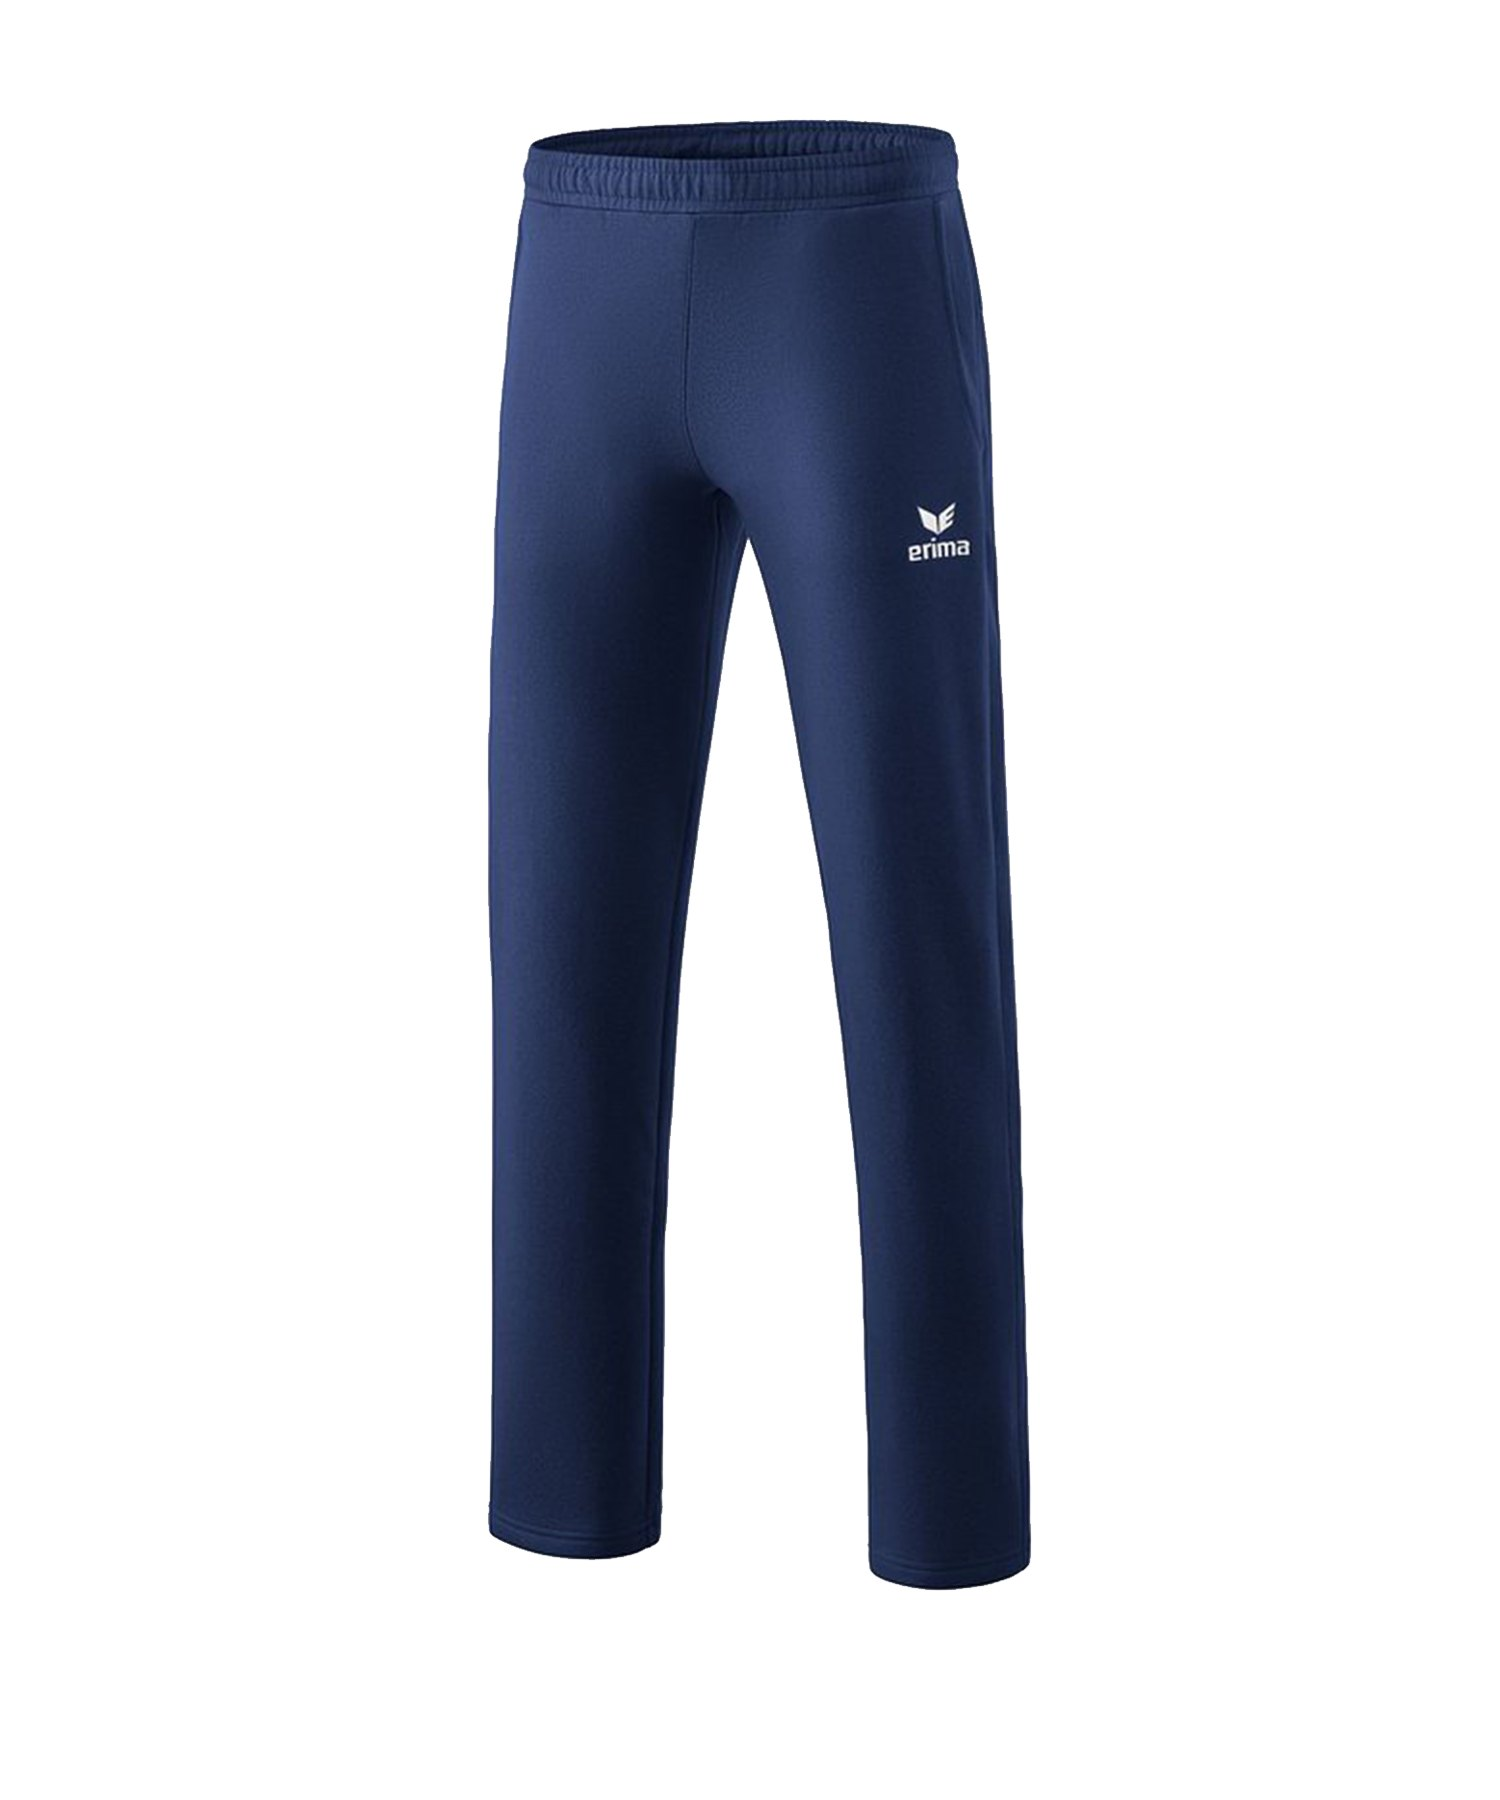 Erima Essential 5-C Sweatpant Kids Blau Weiss - Blau